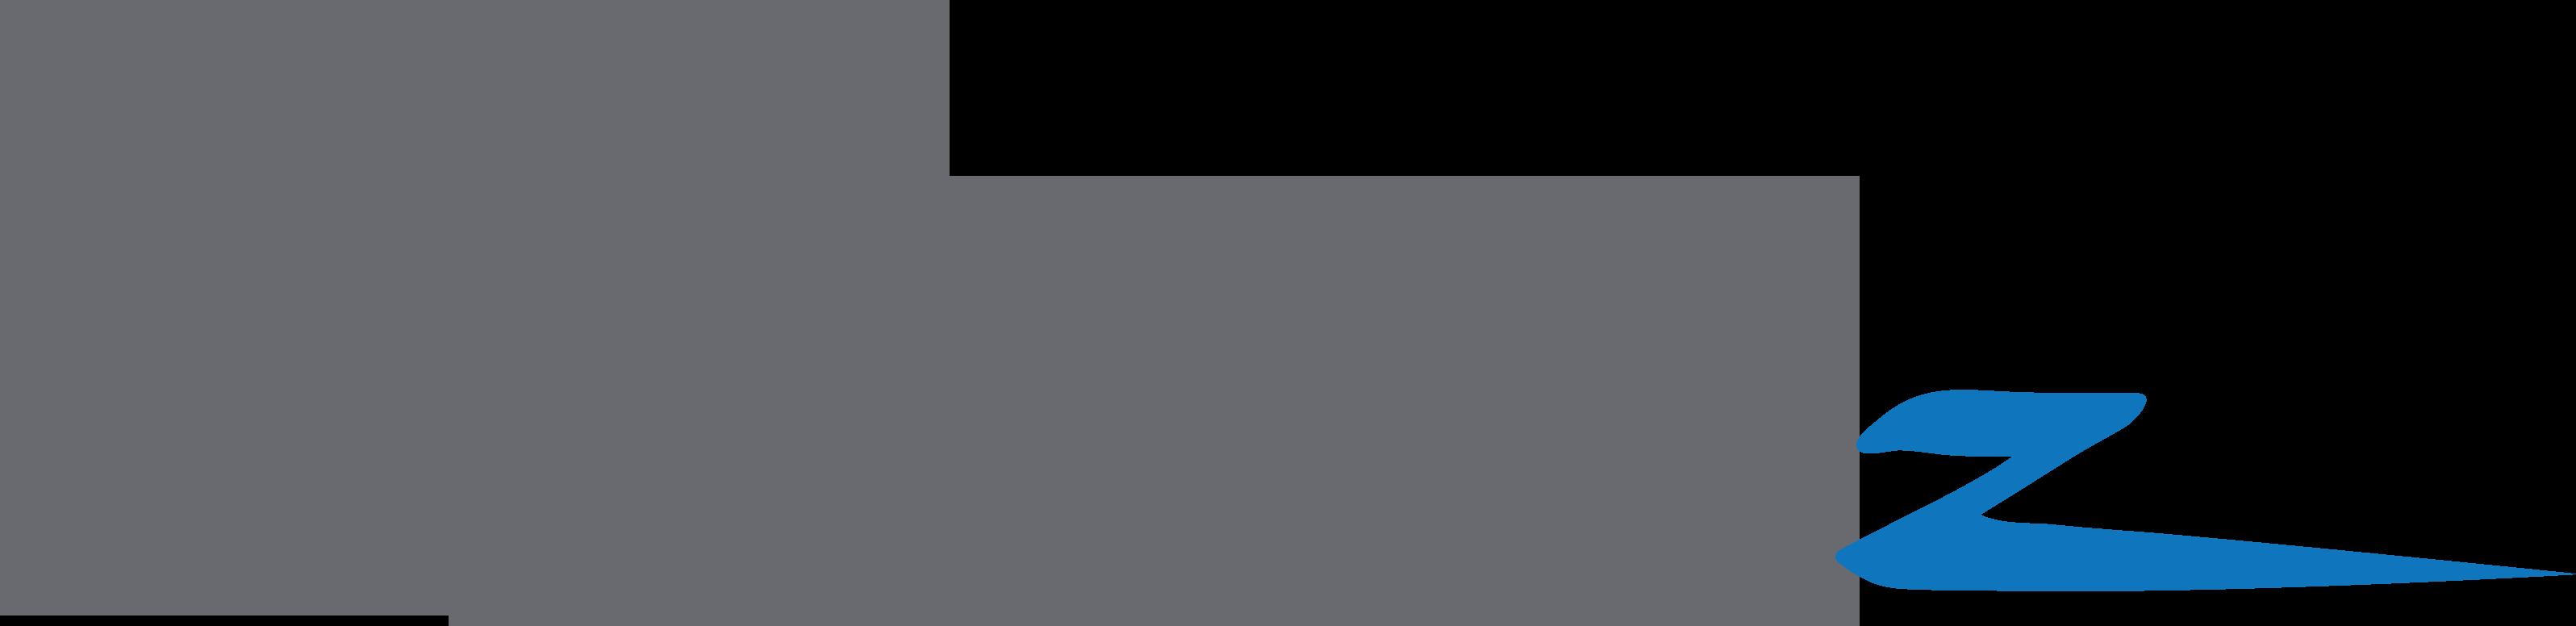 rentalz-logo-darker-gray